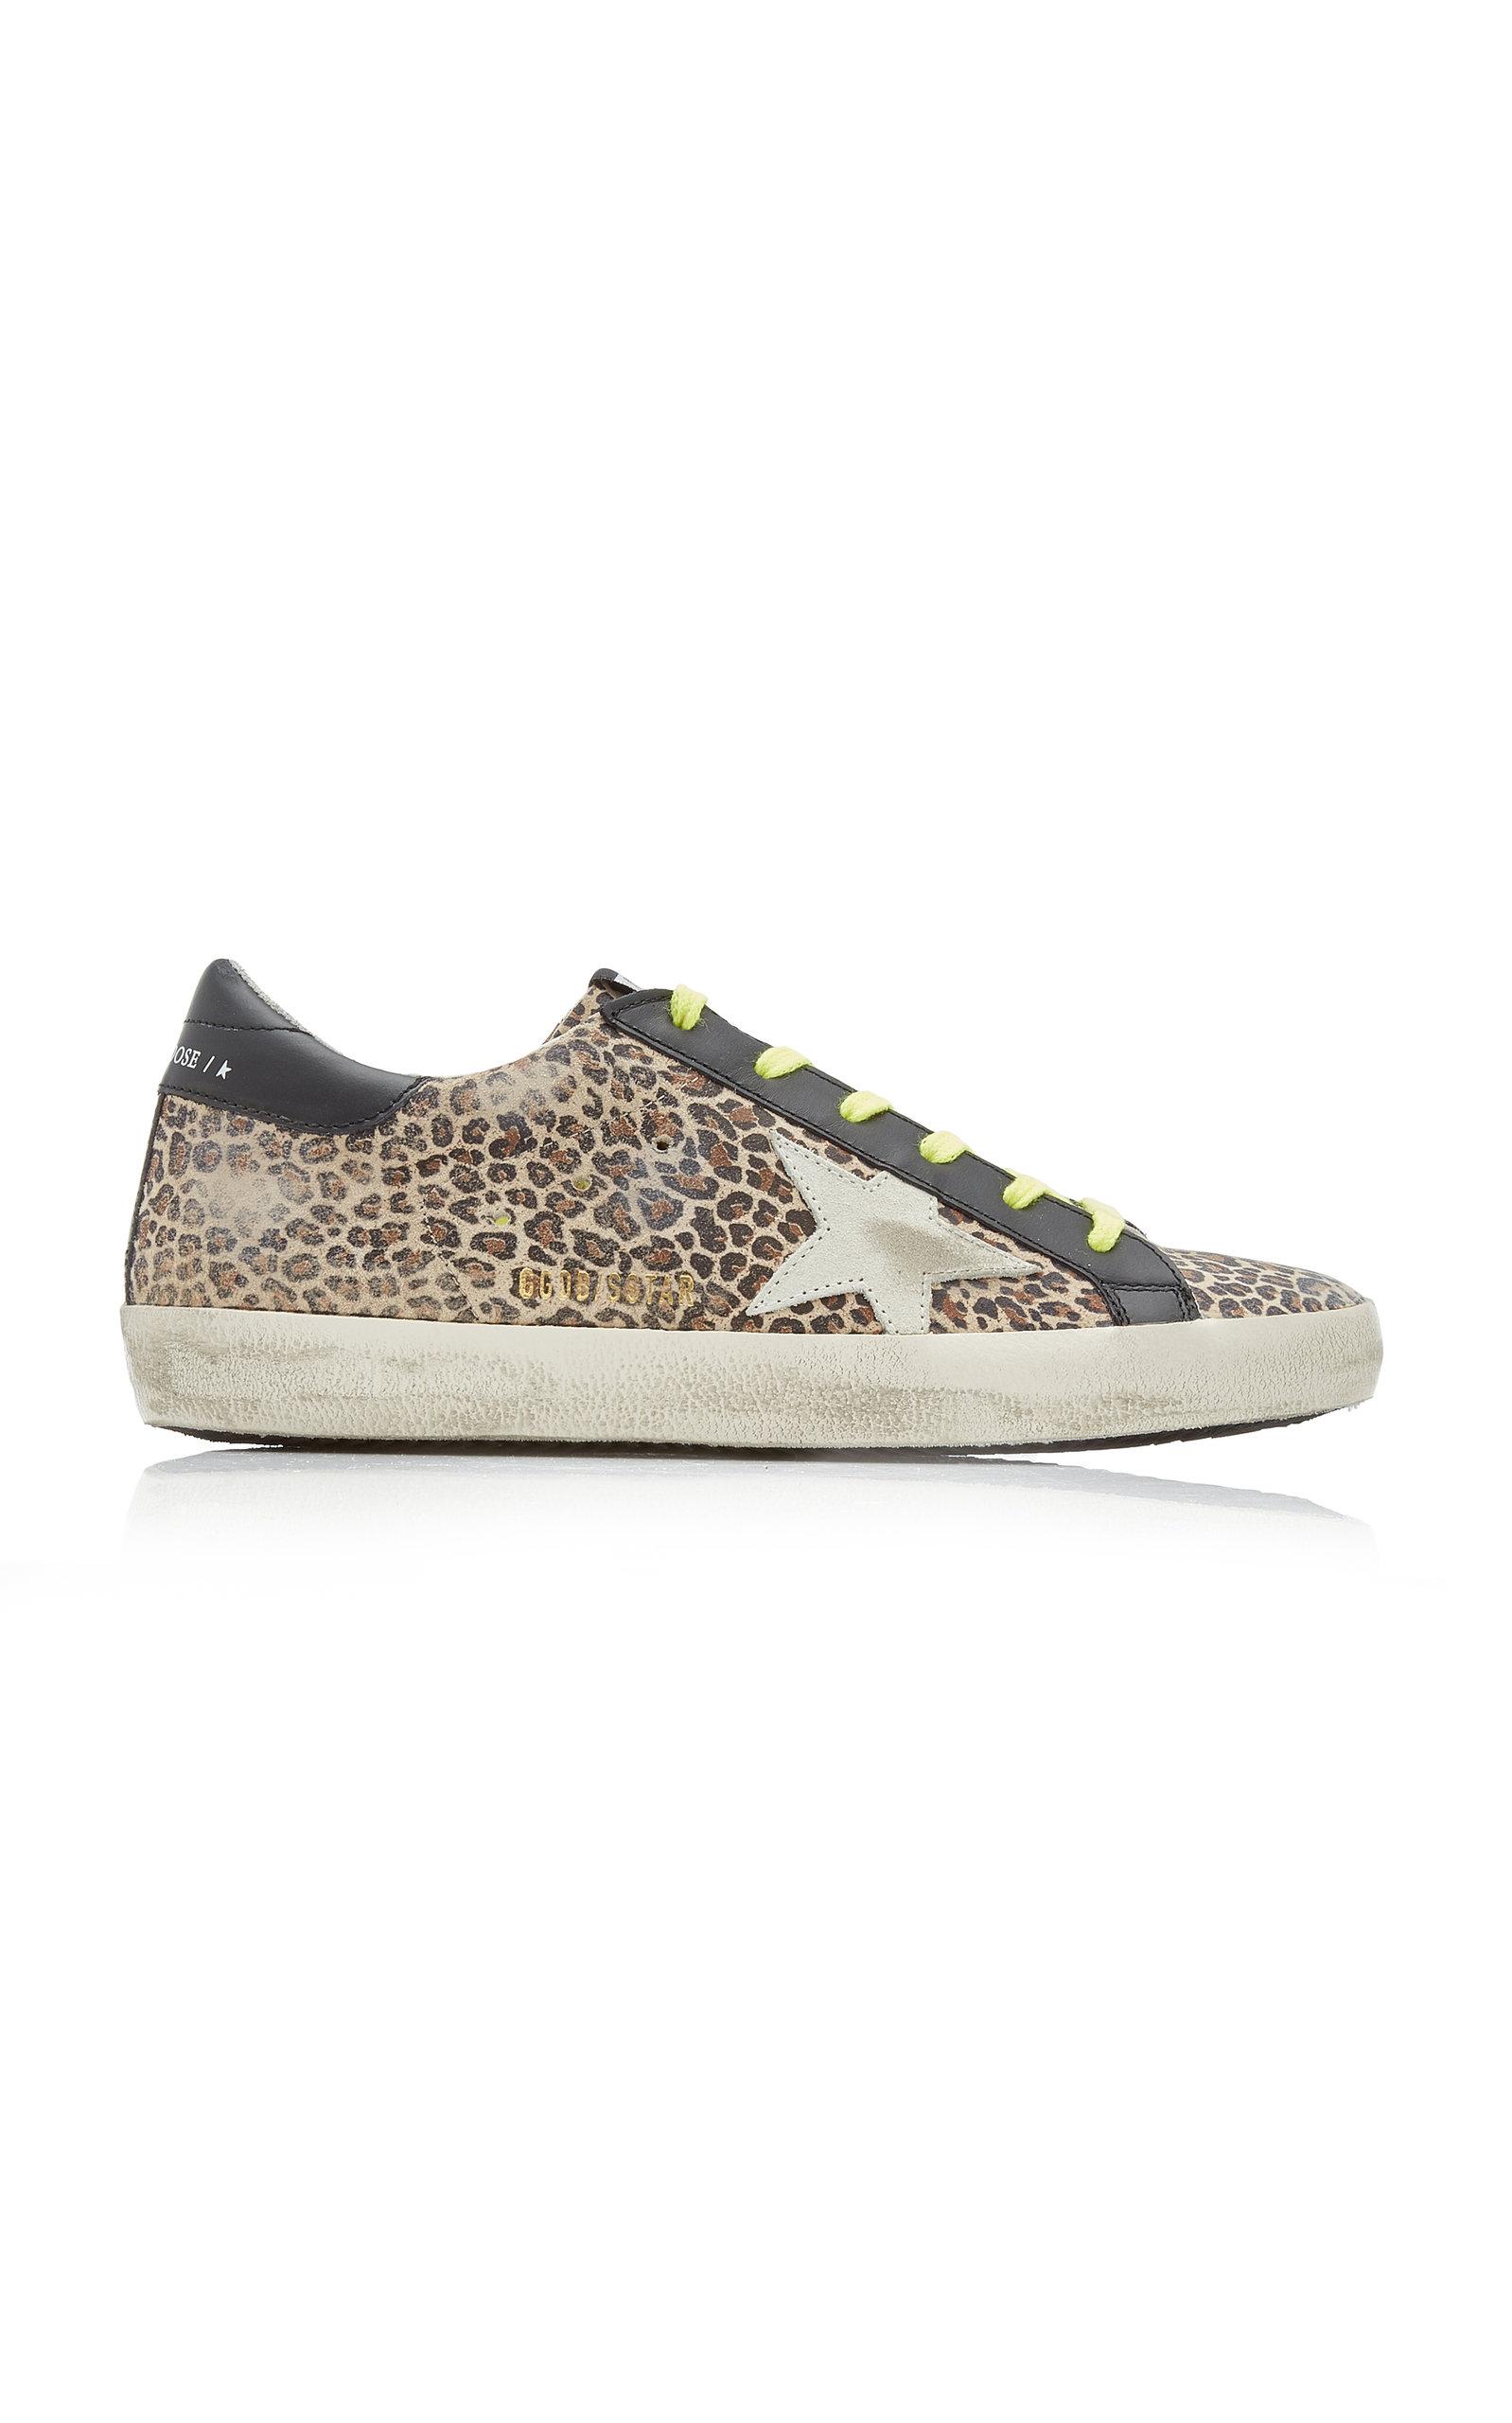 Golden Goose - Women's Superstar Distressed Leopard Leather Sneakers  - Animal - Moda Operandi